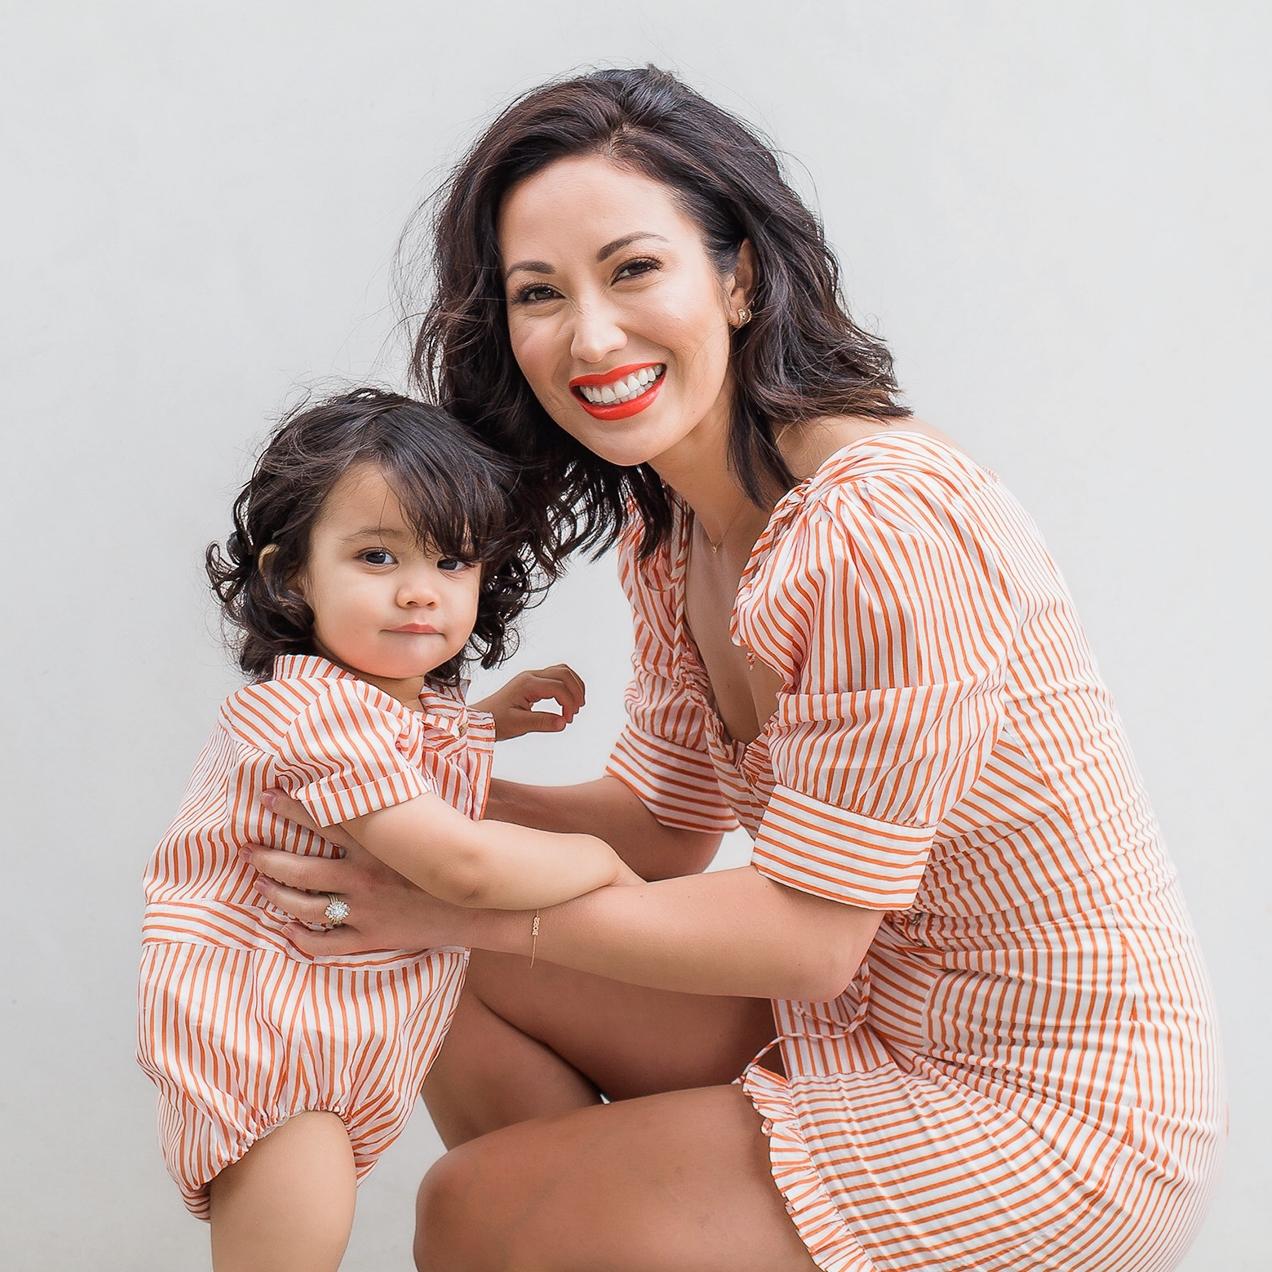 mom-son-matching-4.JPG